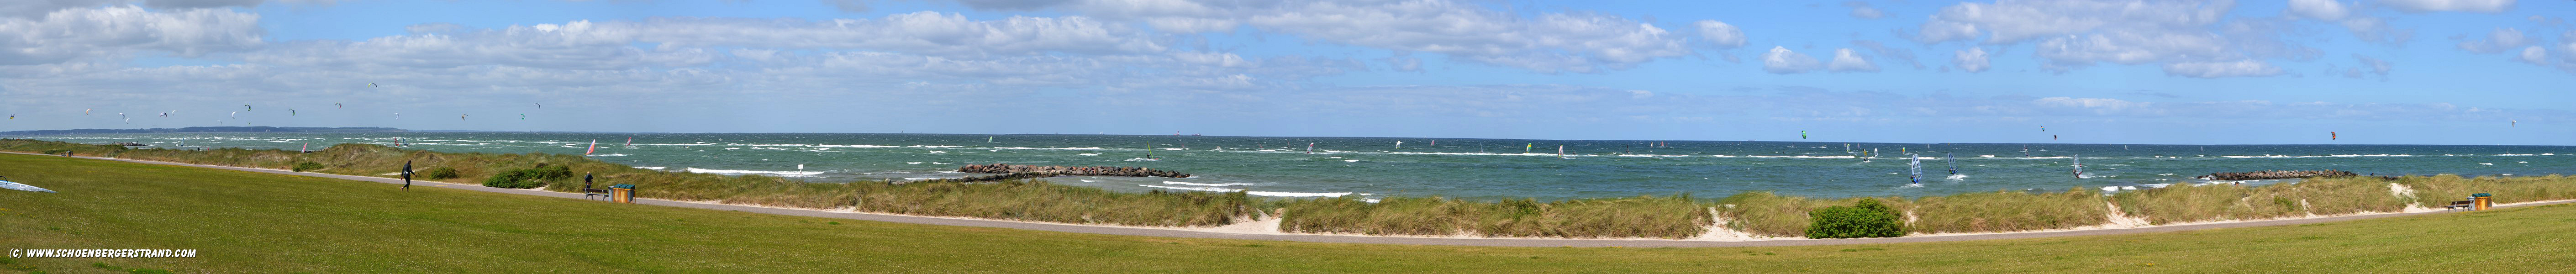 Surfer bei Sturm in Heidkate